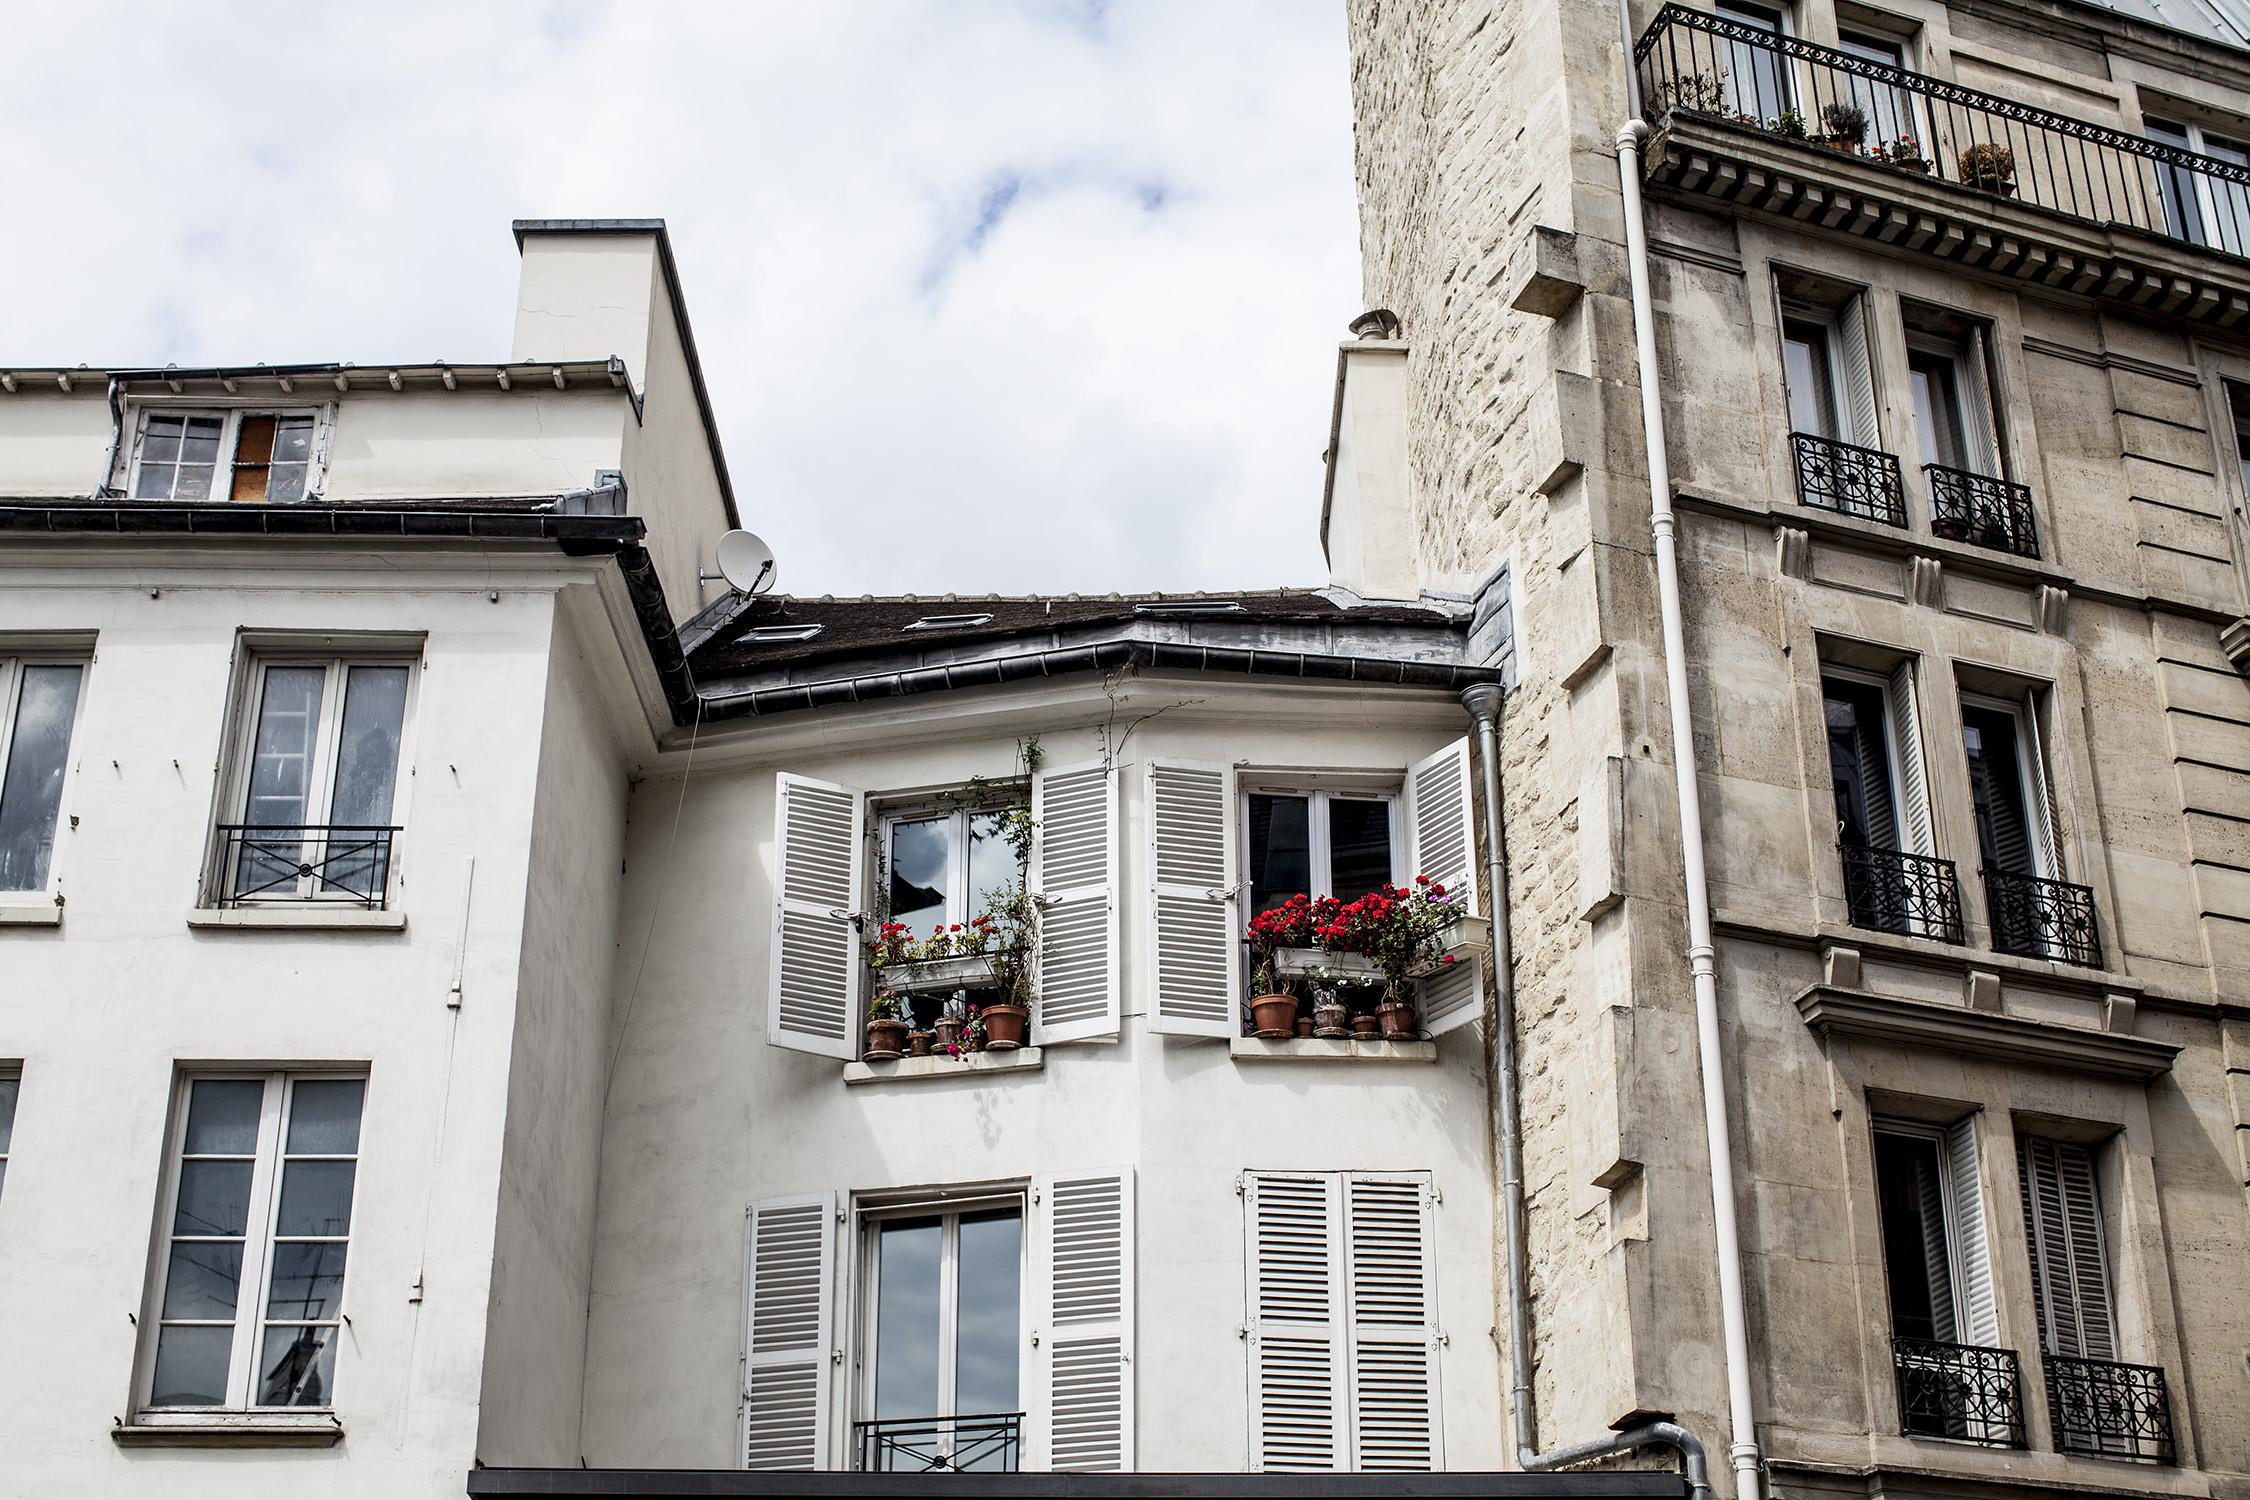 lifestyle-editorial-travel-washington-dc-malek-naz-photography-paris-france-windows.jpg